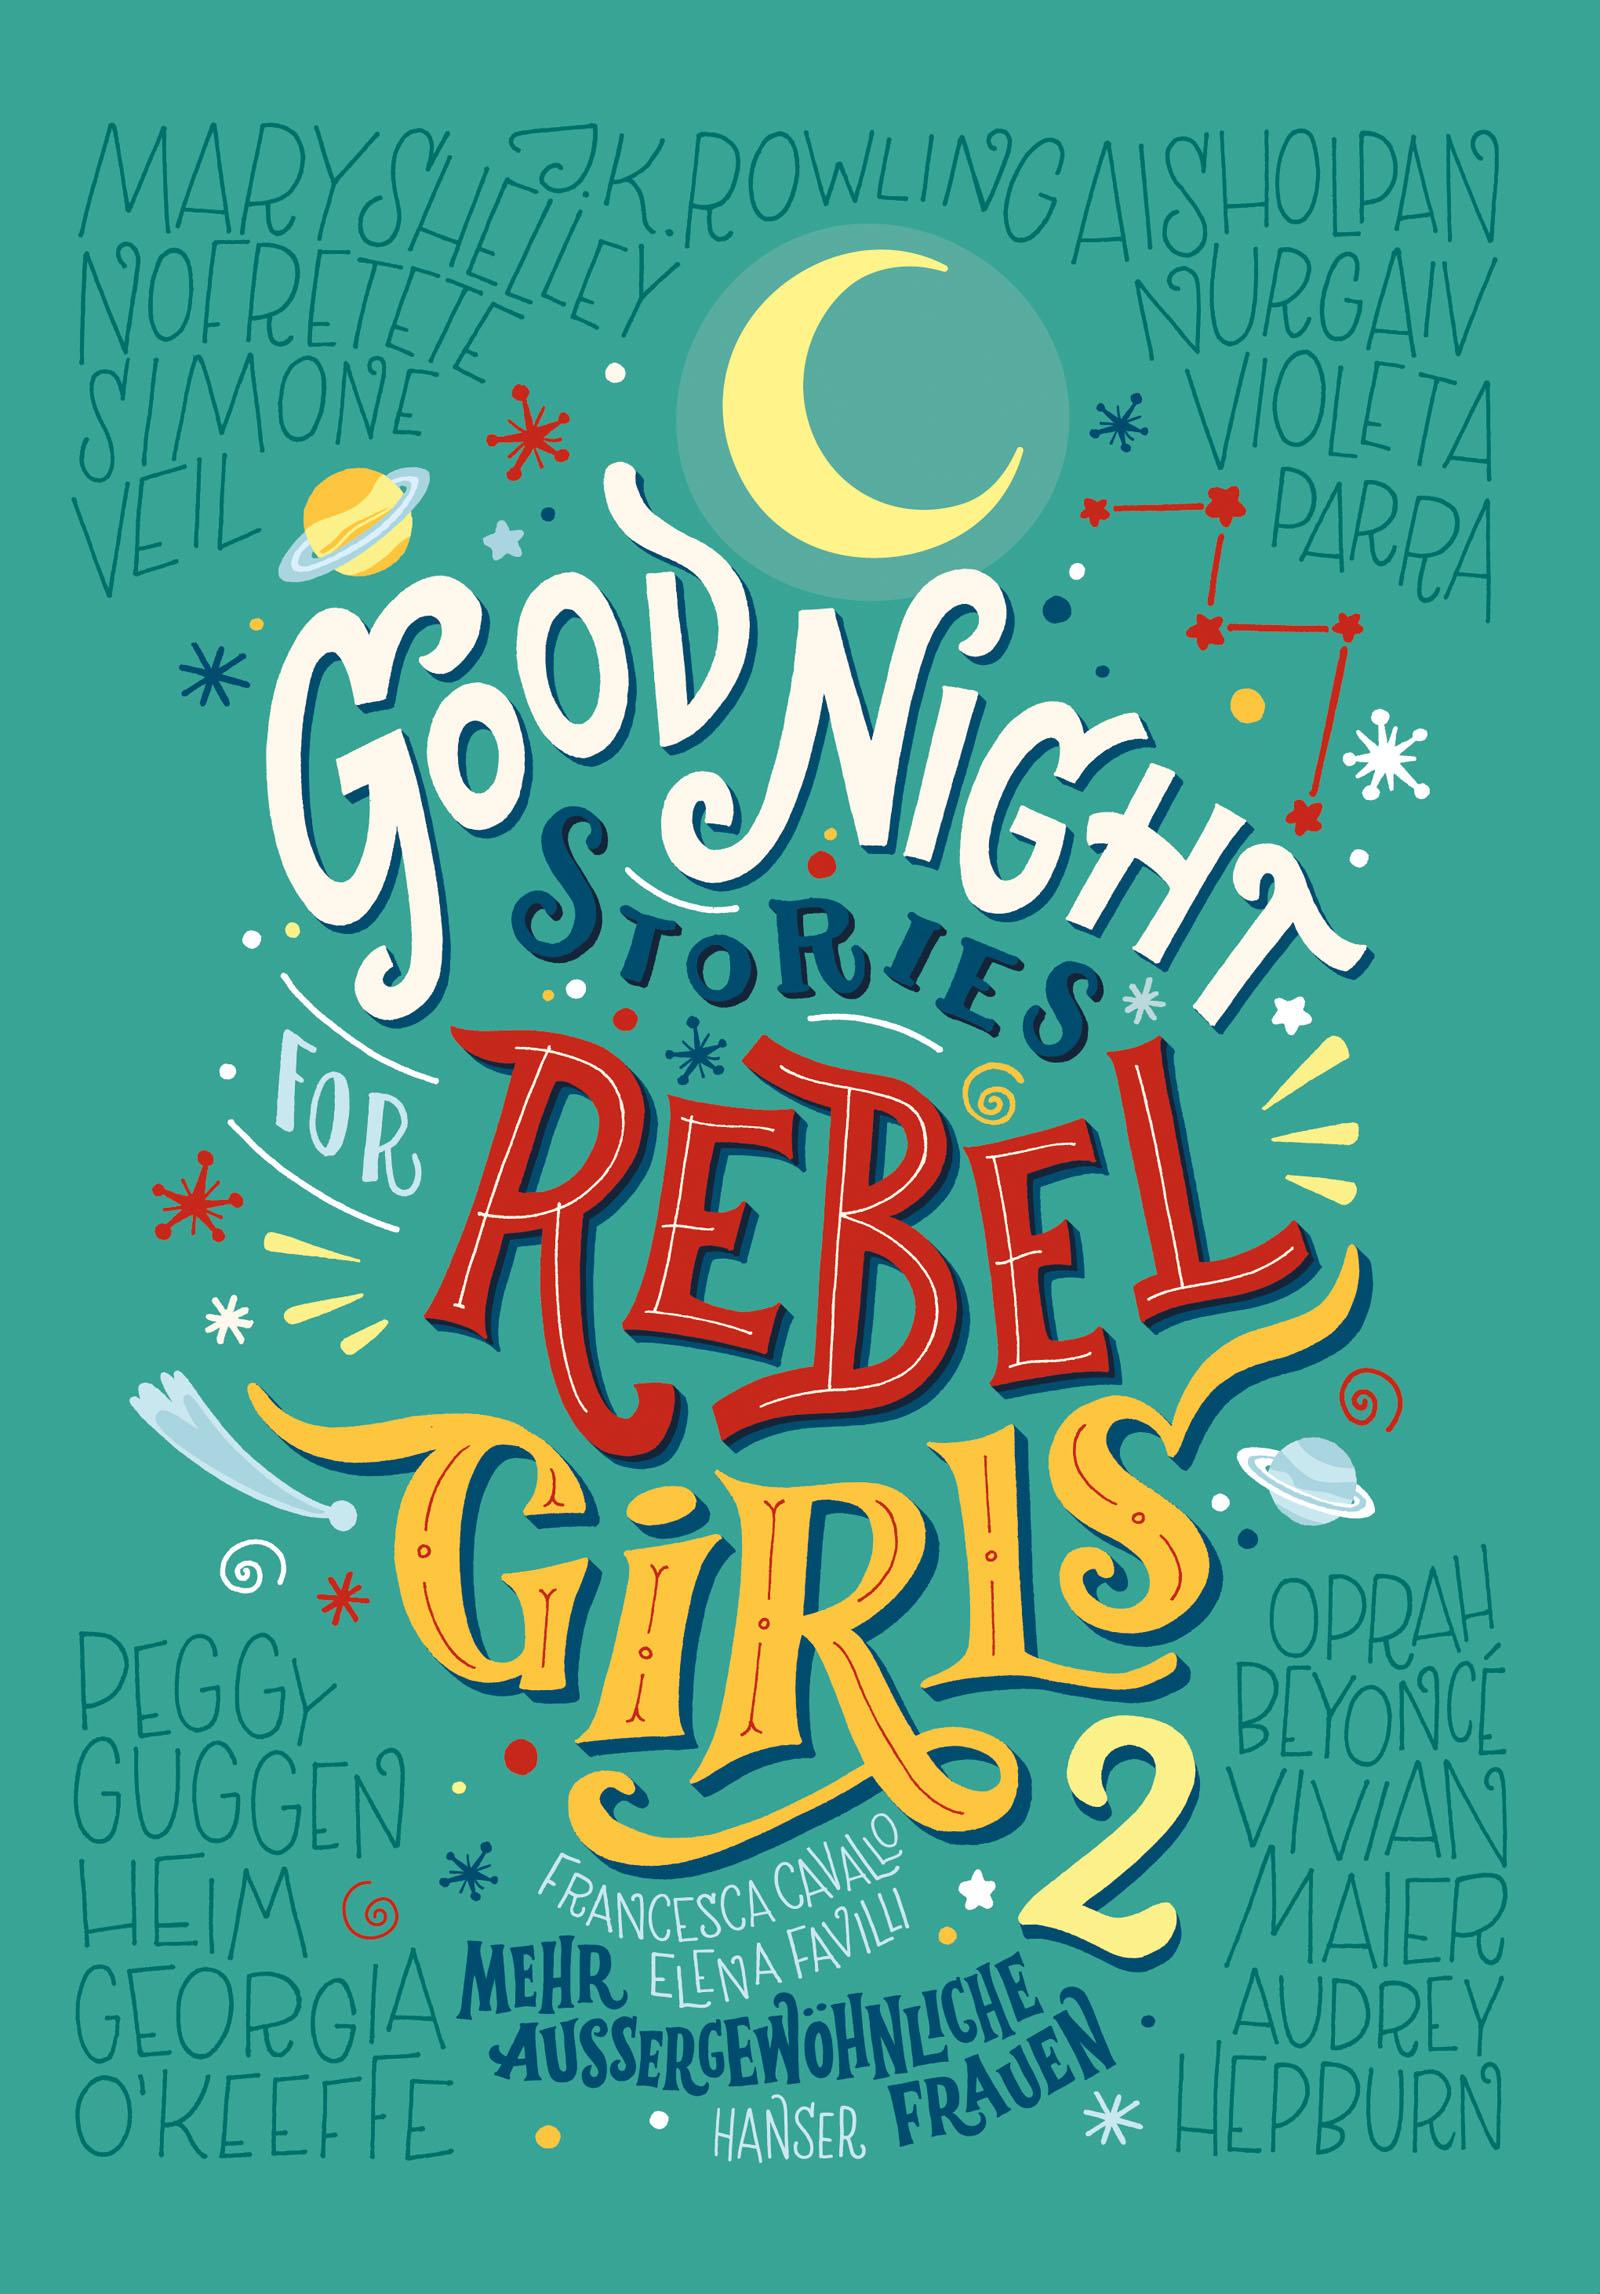 https://www.hanser-literaturverlage.de/buch/good-night-stories-for-rebel-girls-2/978-3-446-26106-8/